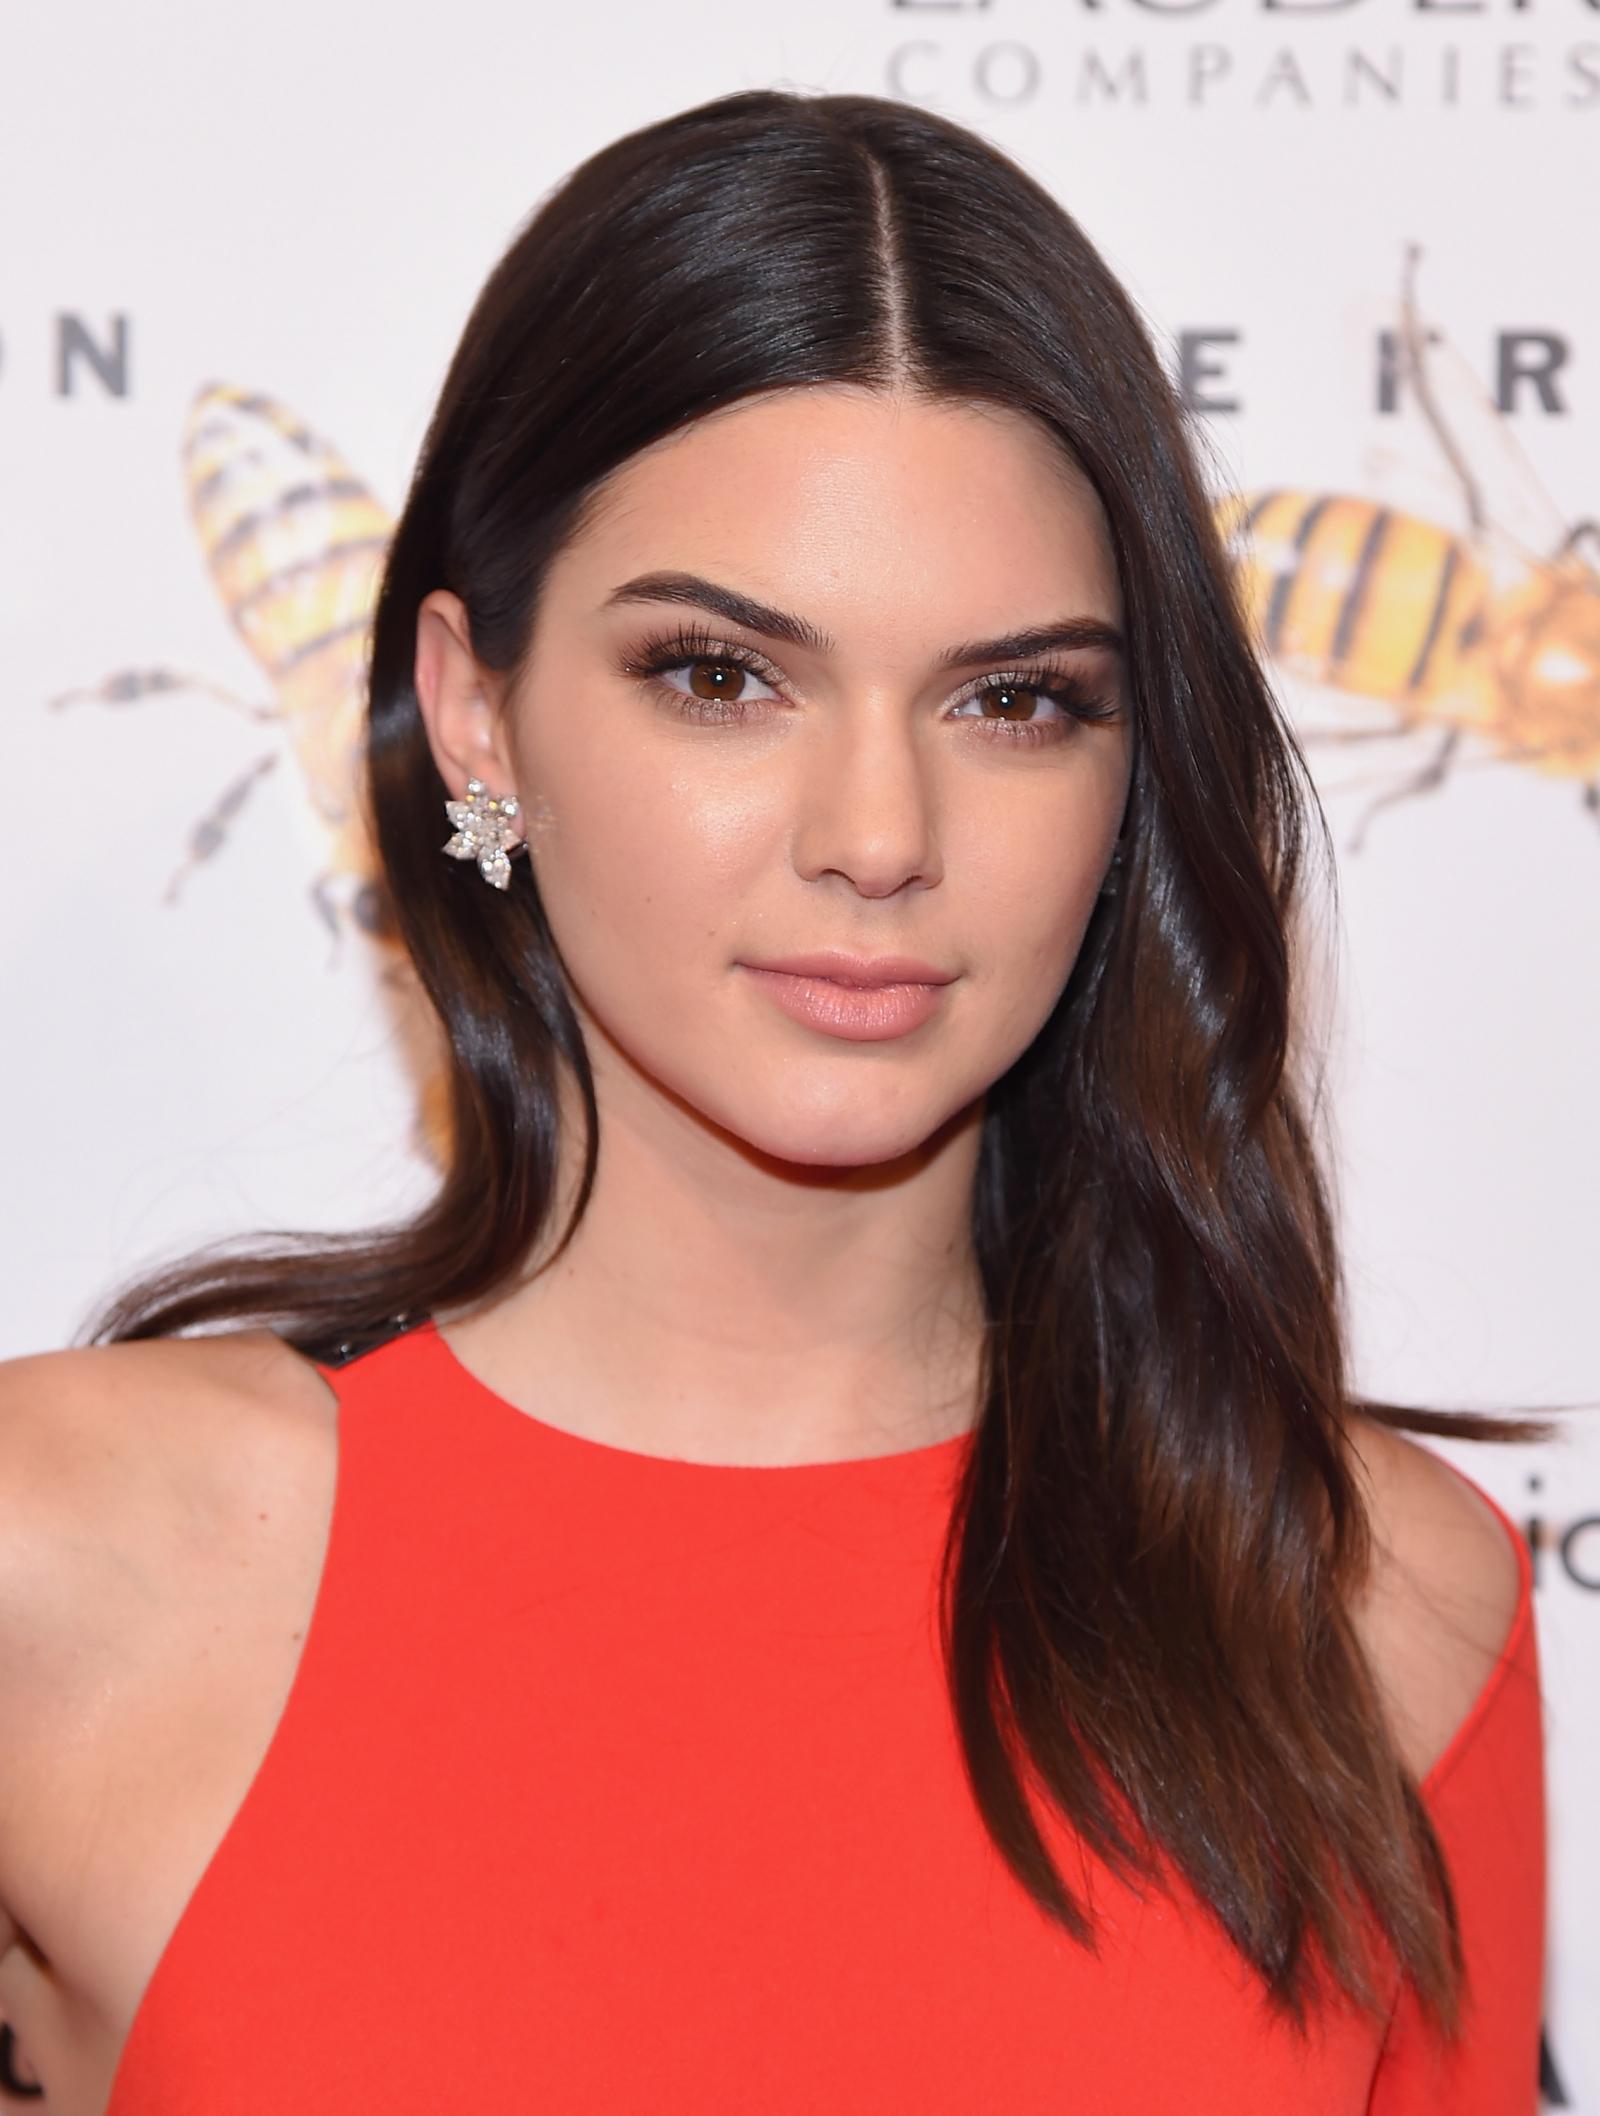 Kendall jenner dating taylor lautner game